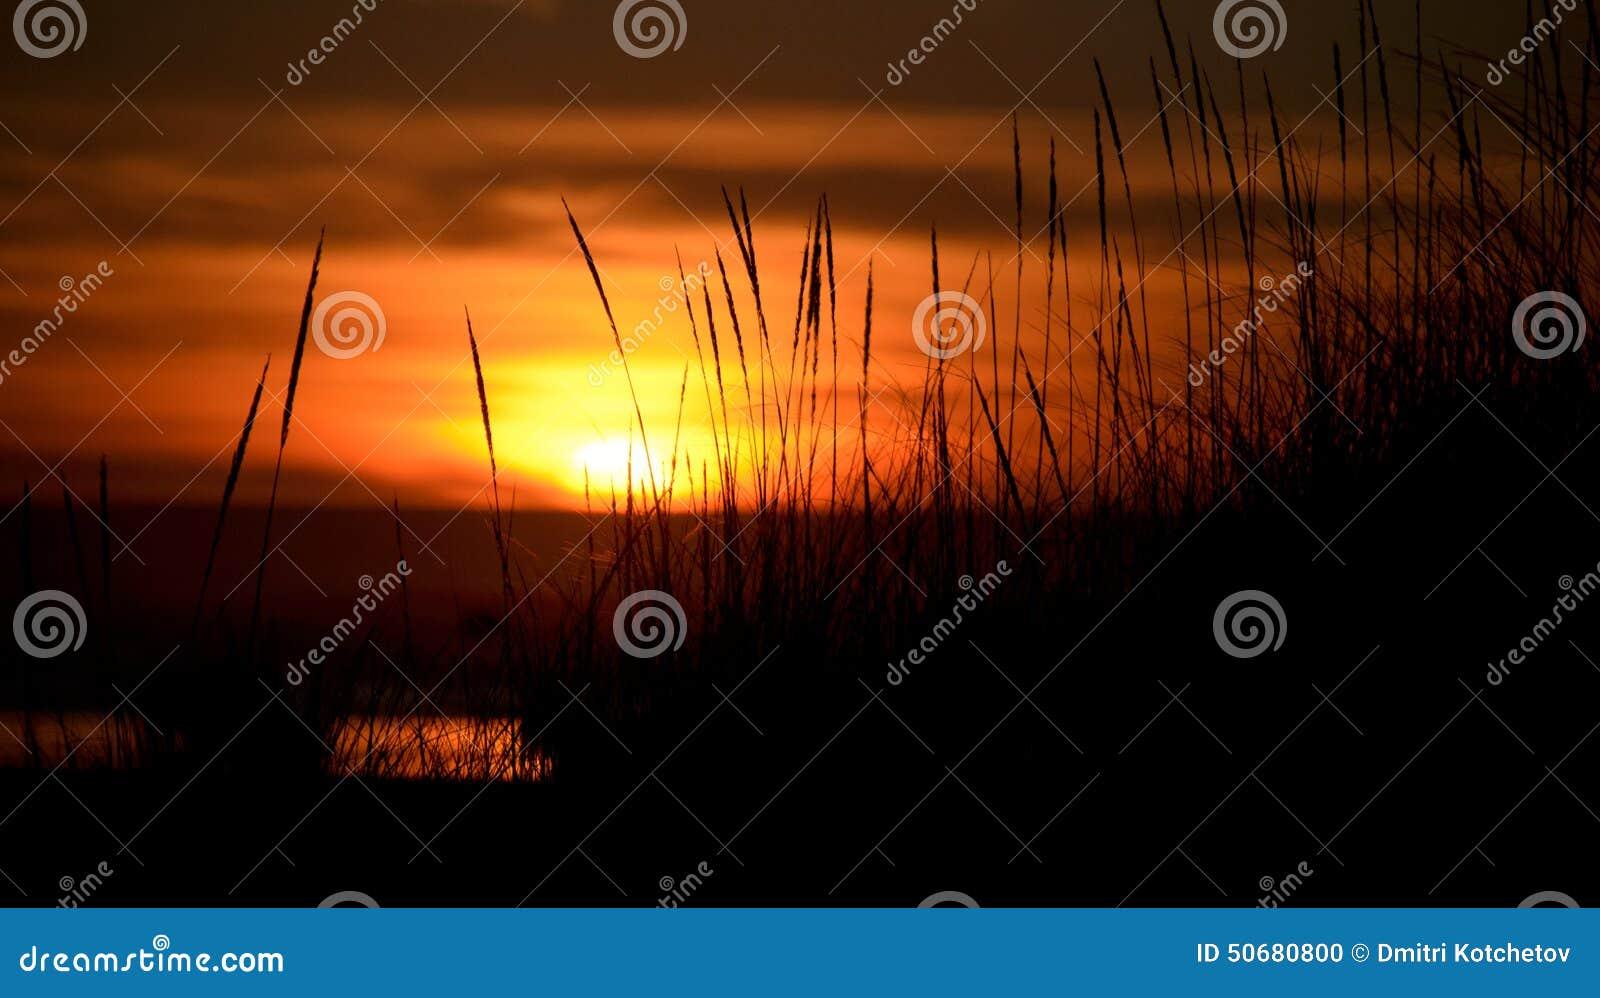 Download 在日落突出的沙丘的高草 库存照片. 图片 包括有 户外, 和平, 远足者, 火箭筒, 土坎, 小山, 海洋 - 50680800